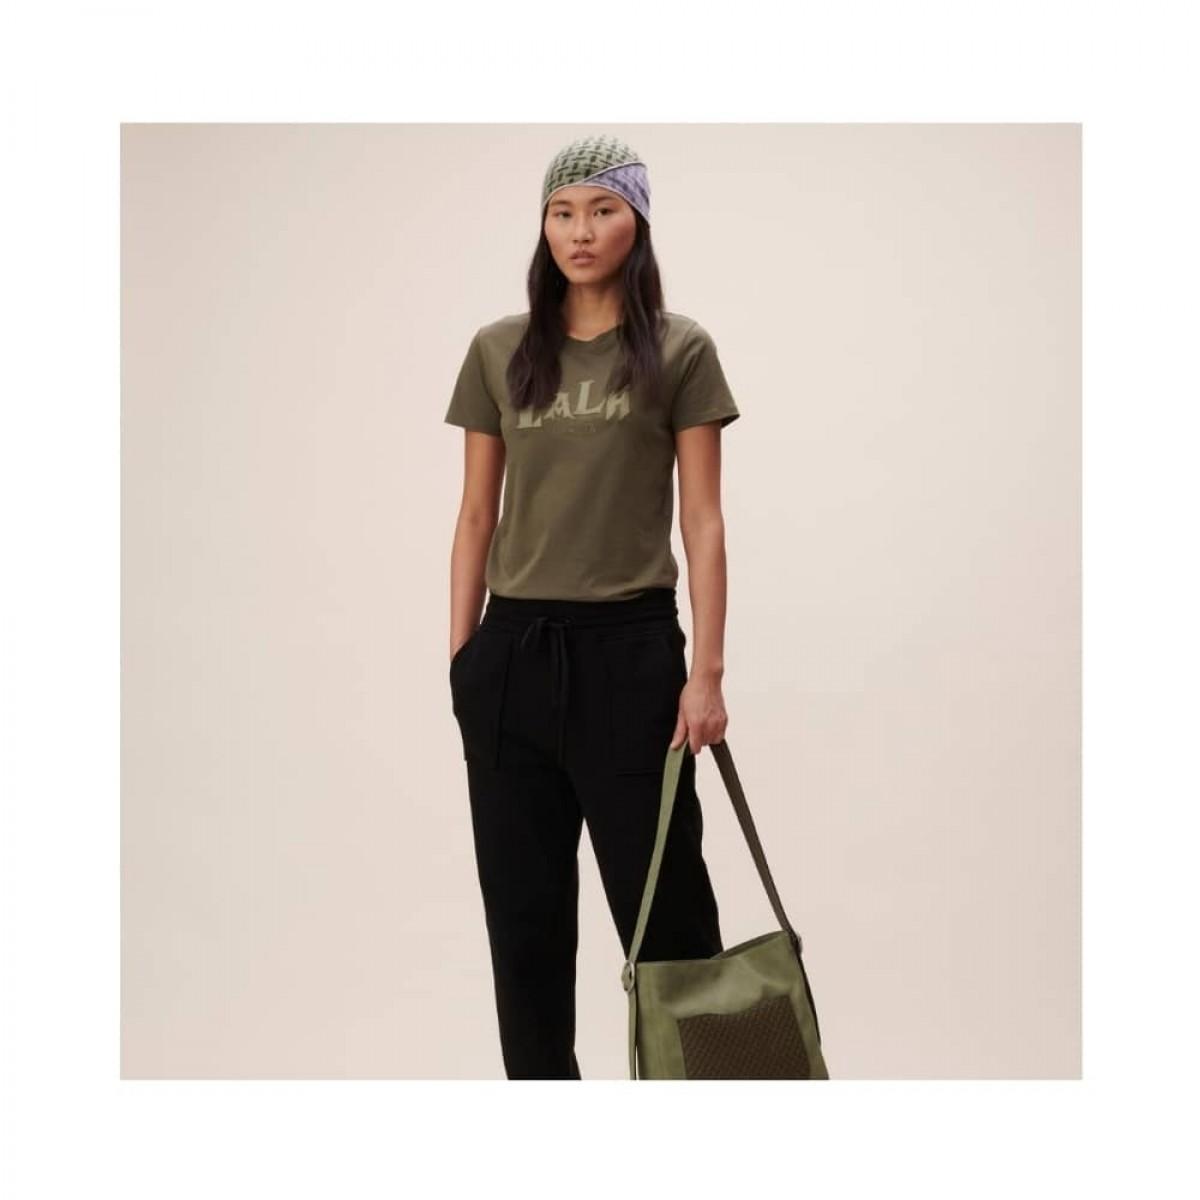 t-shirt reda lala mix - olive night - model front